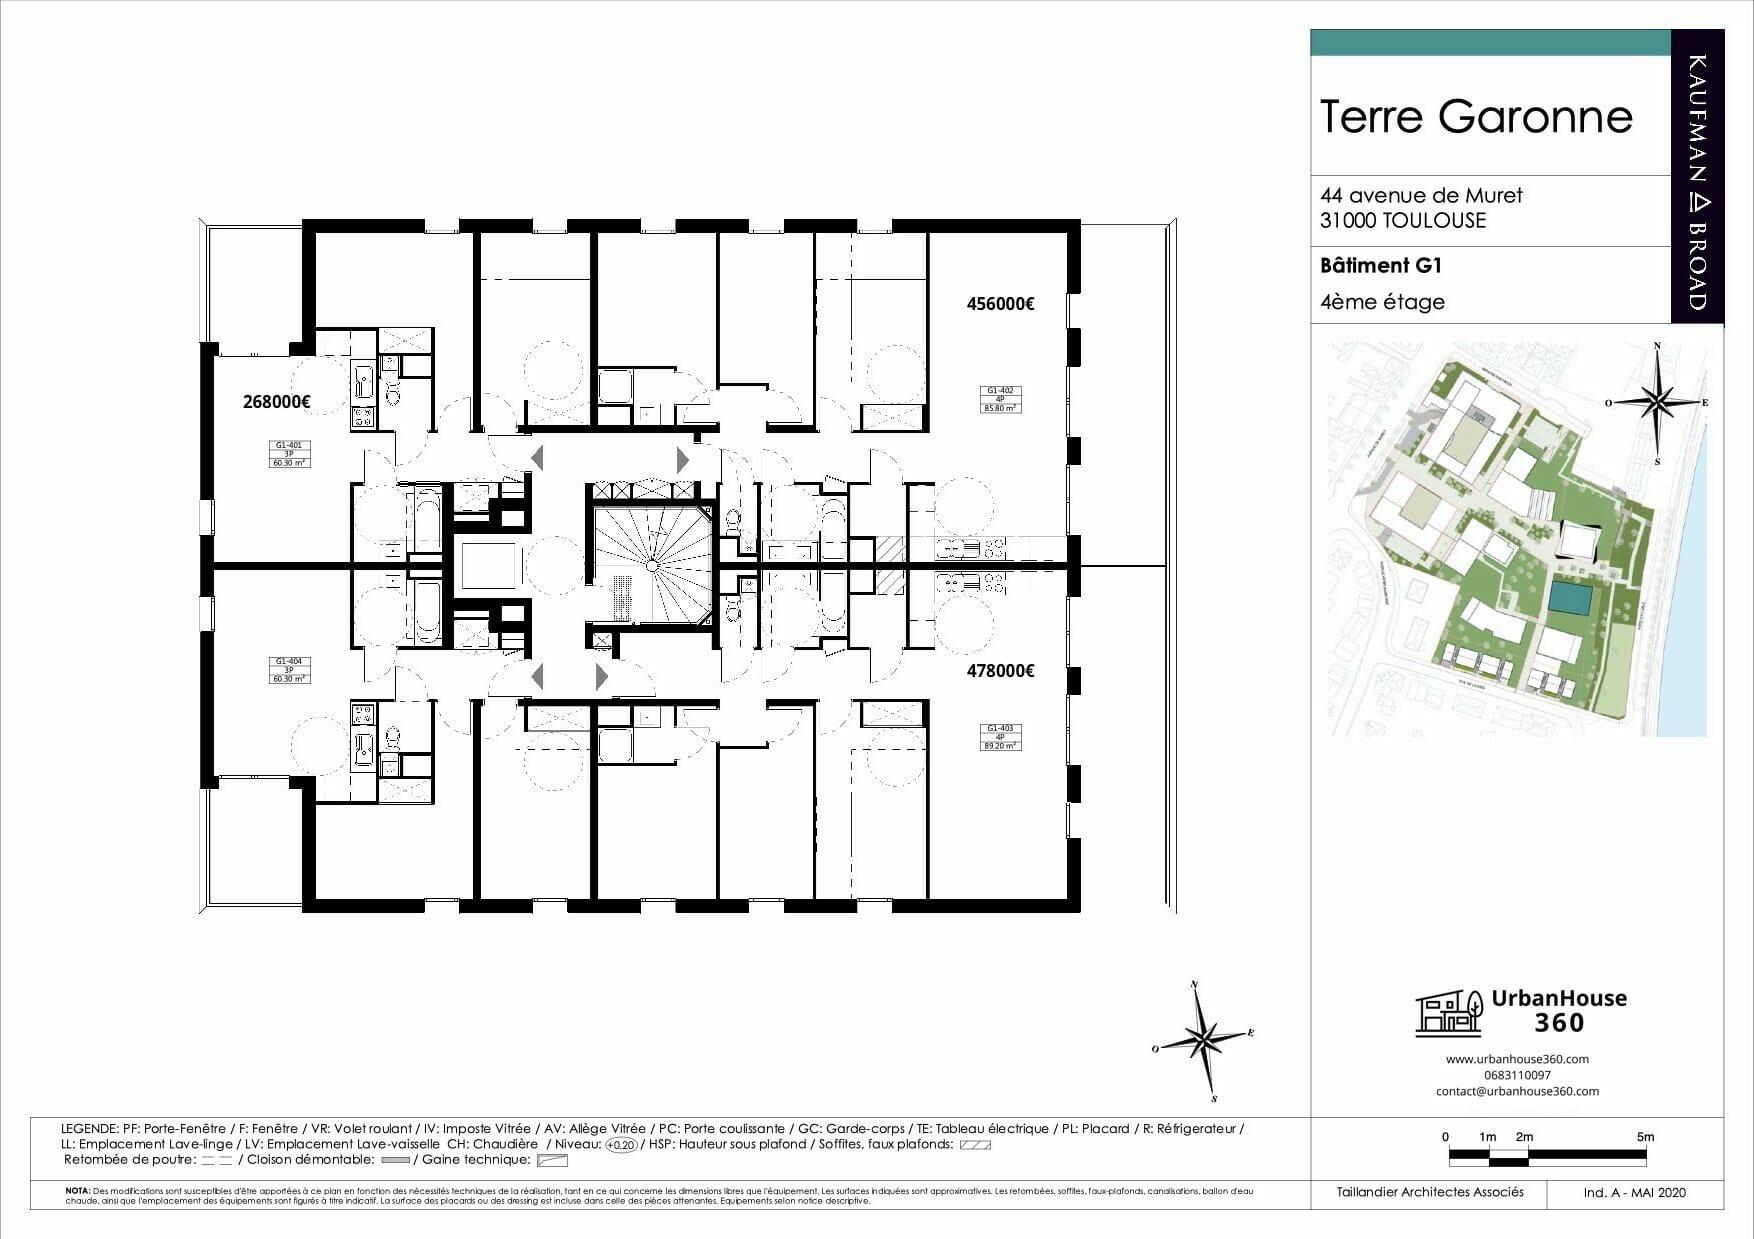 Urbanhouse360-Kaufman-Broad-Terre-Garonne_G1-R+4_2D 2